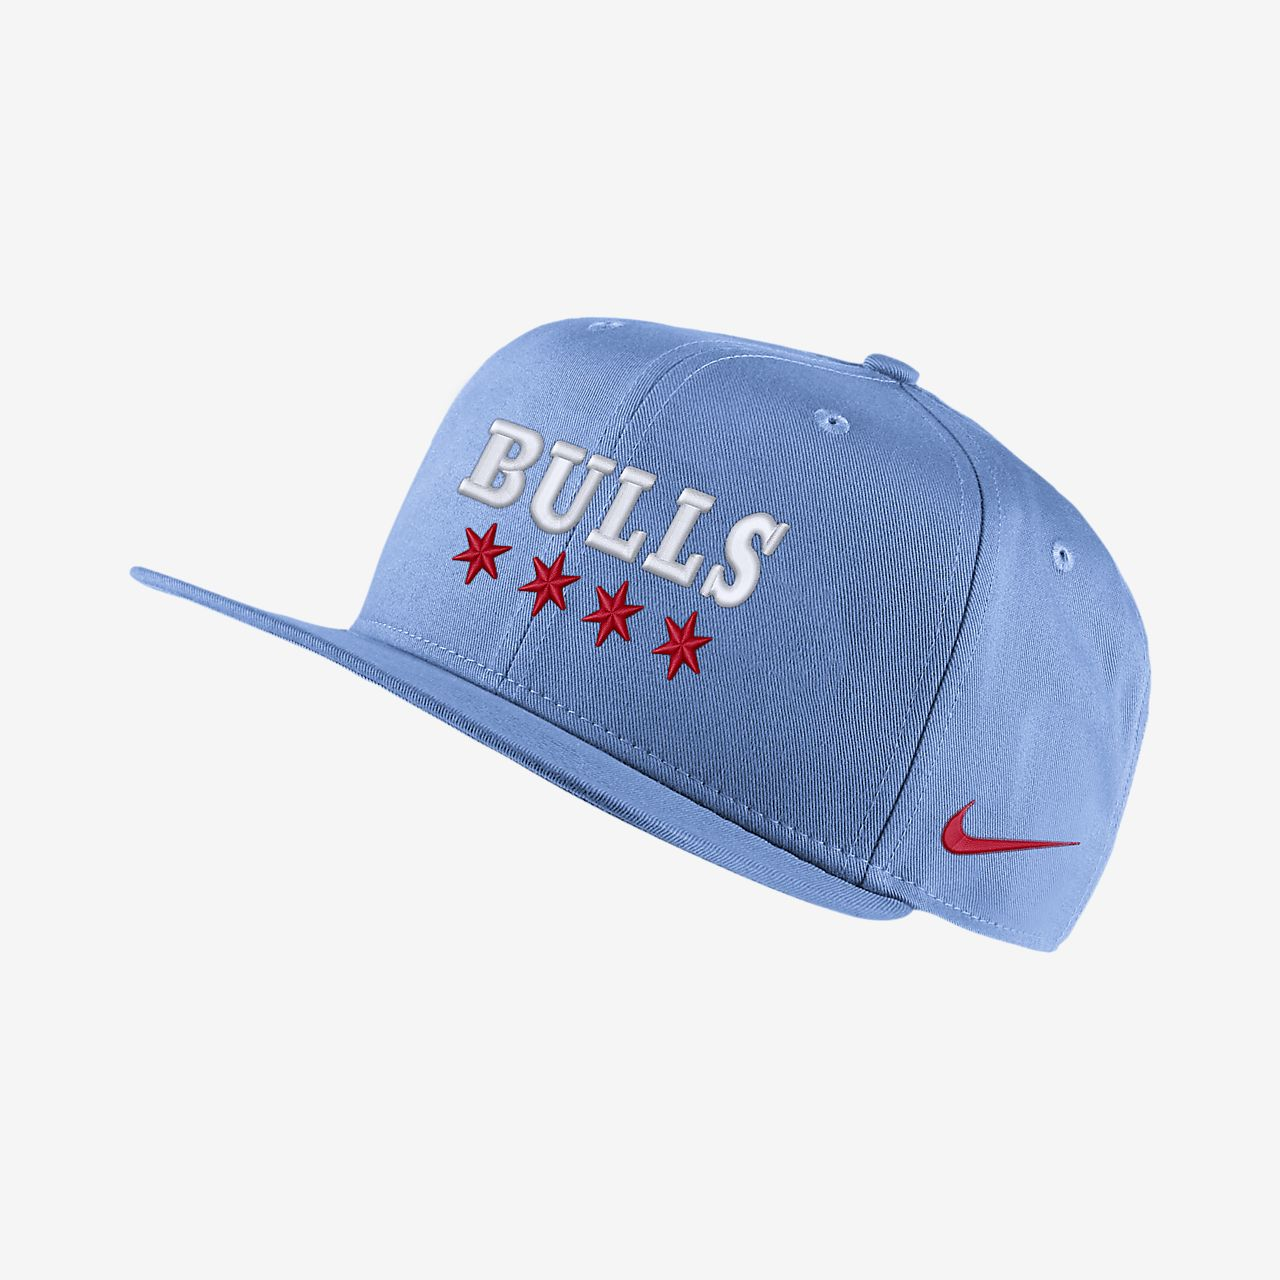 Gorra ajustable Nike Pro NBA Bulls City Edition